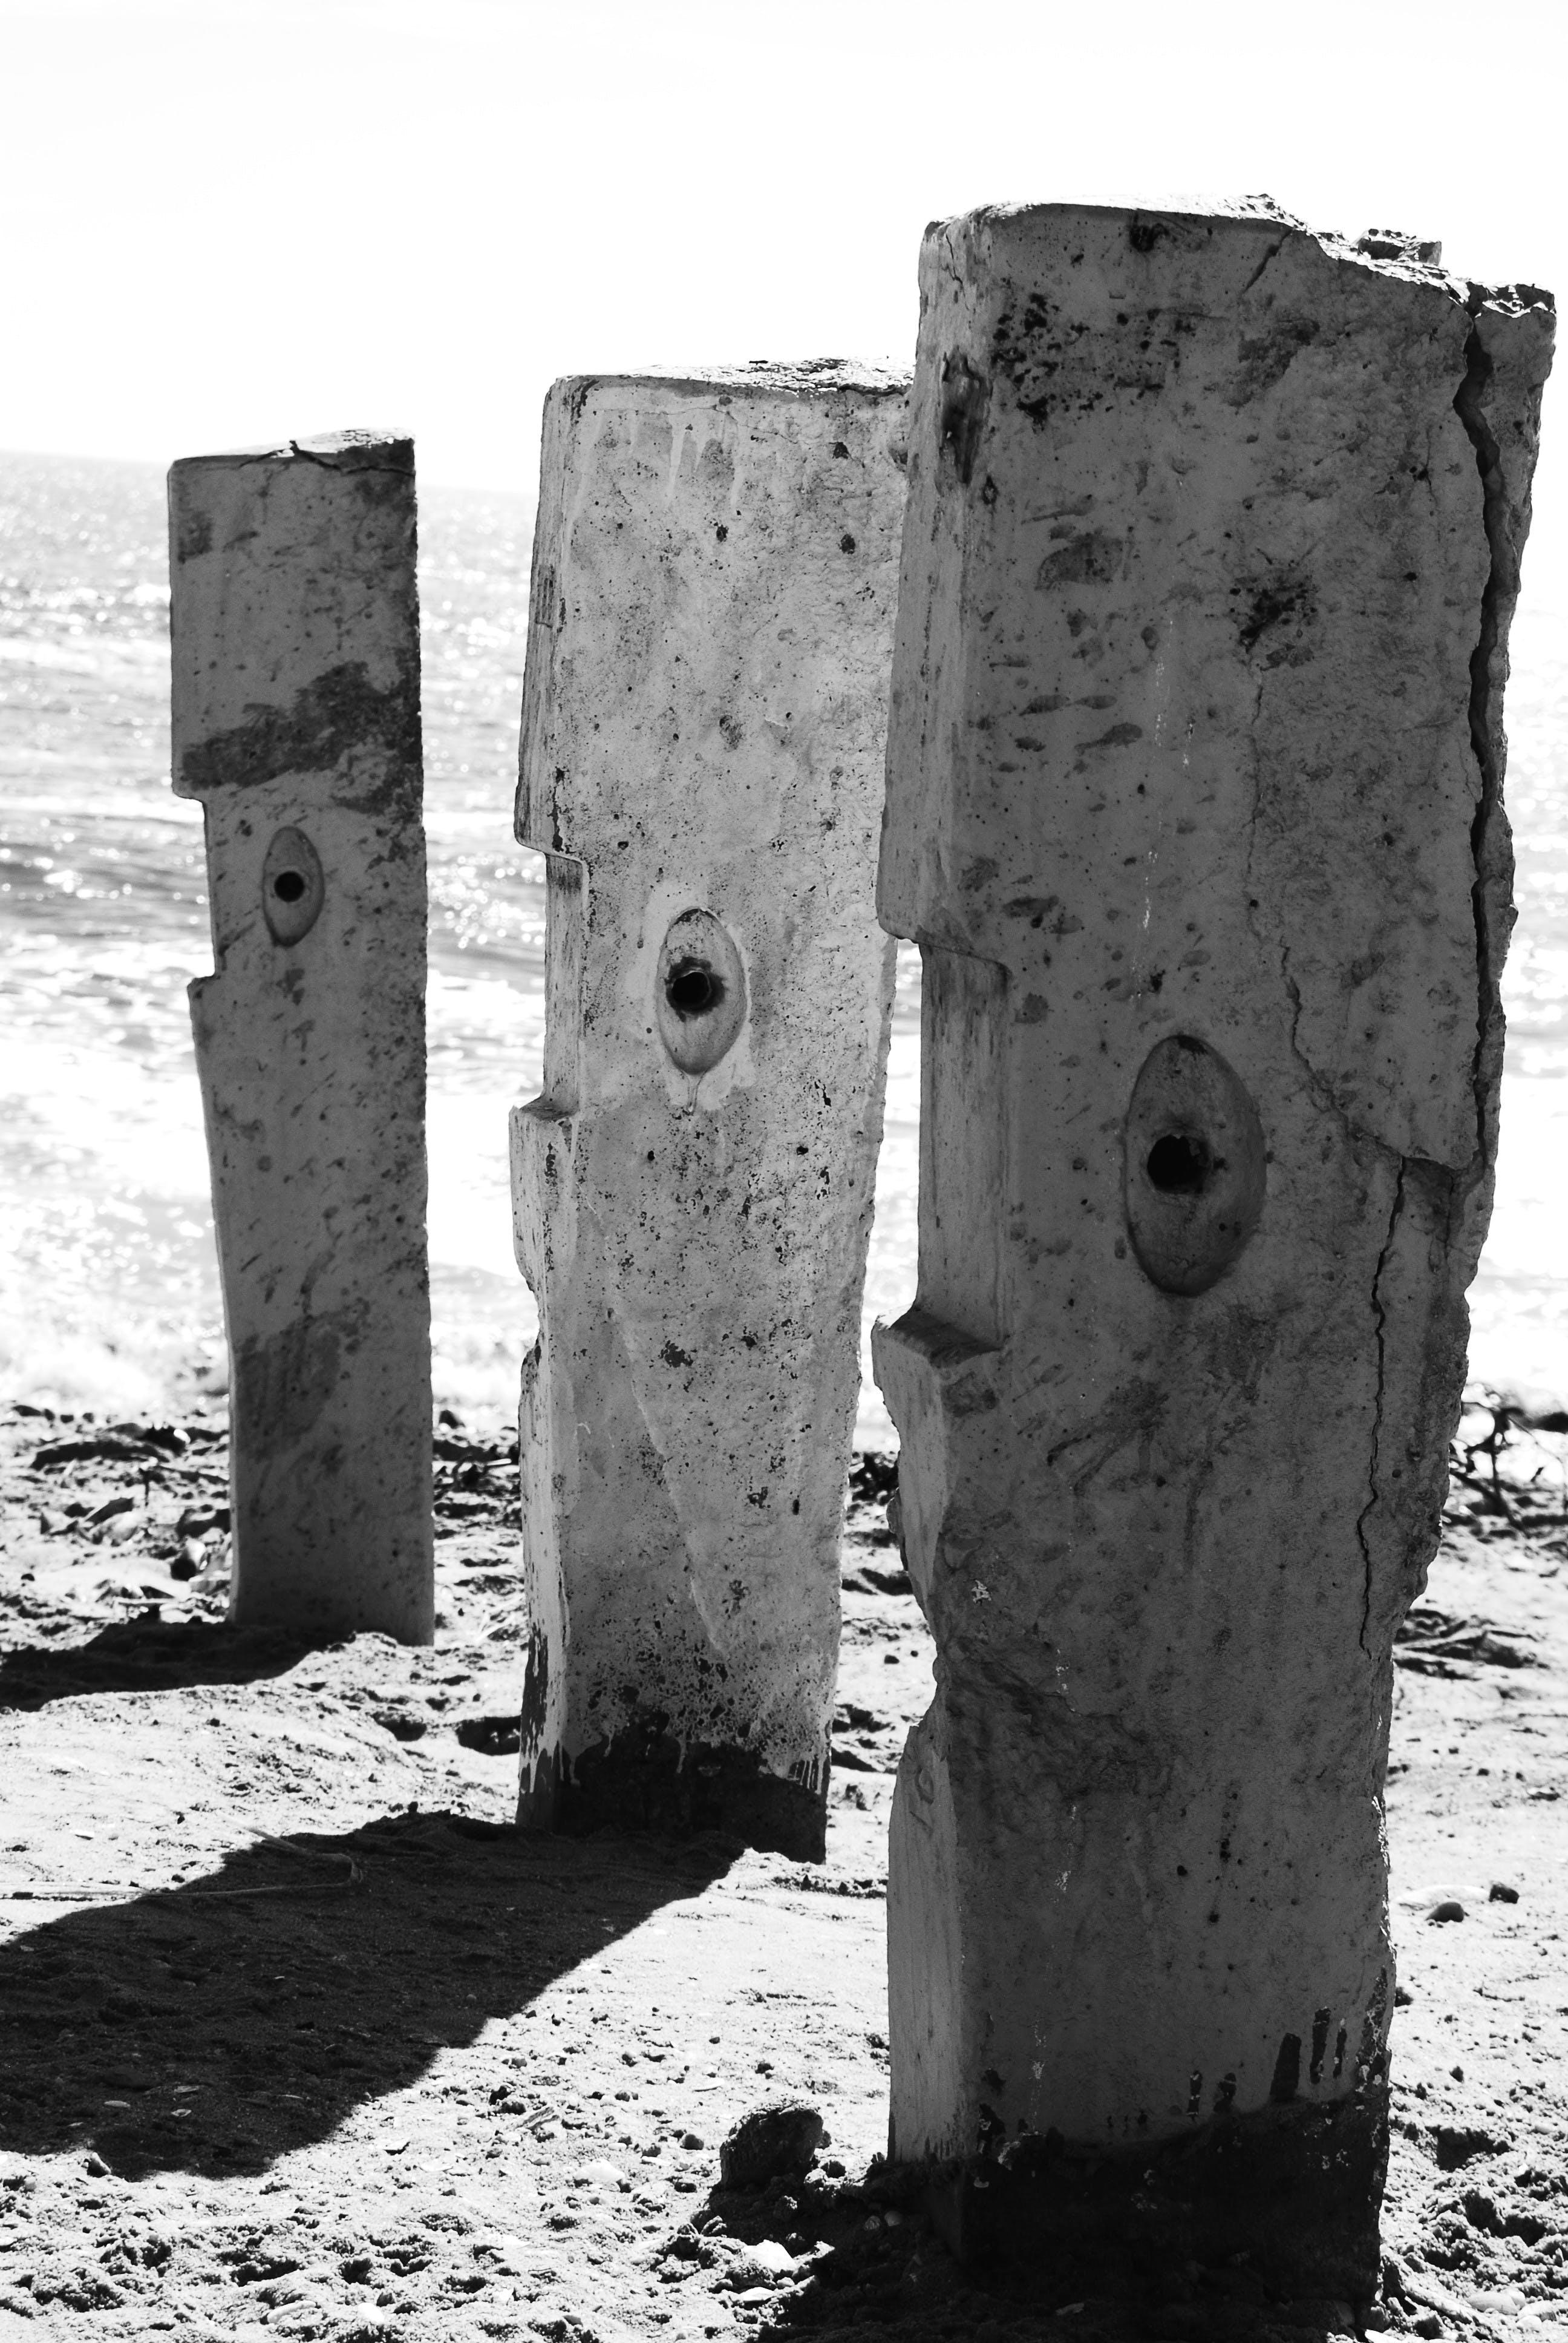 Free stock photo of Stone Faces Black White Abstract